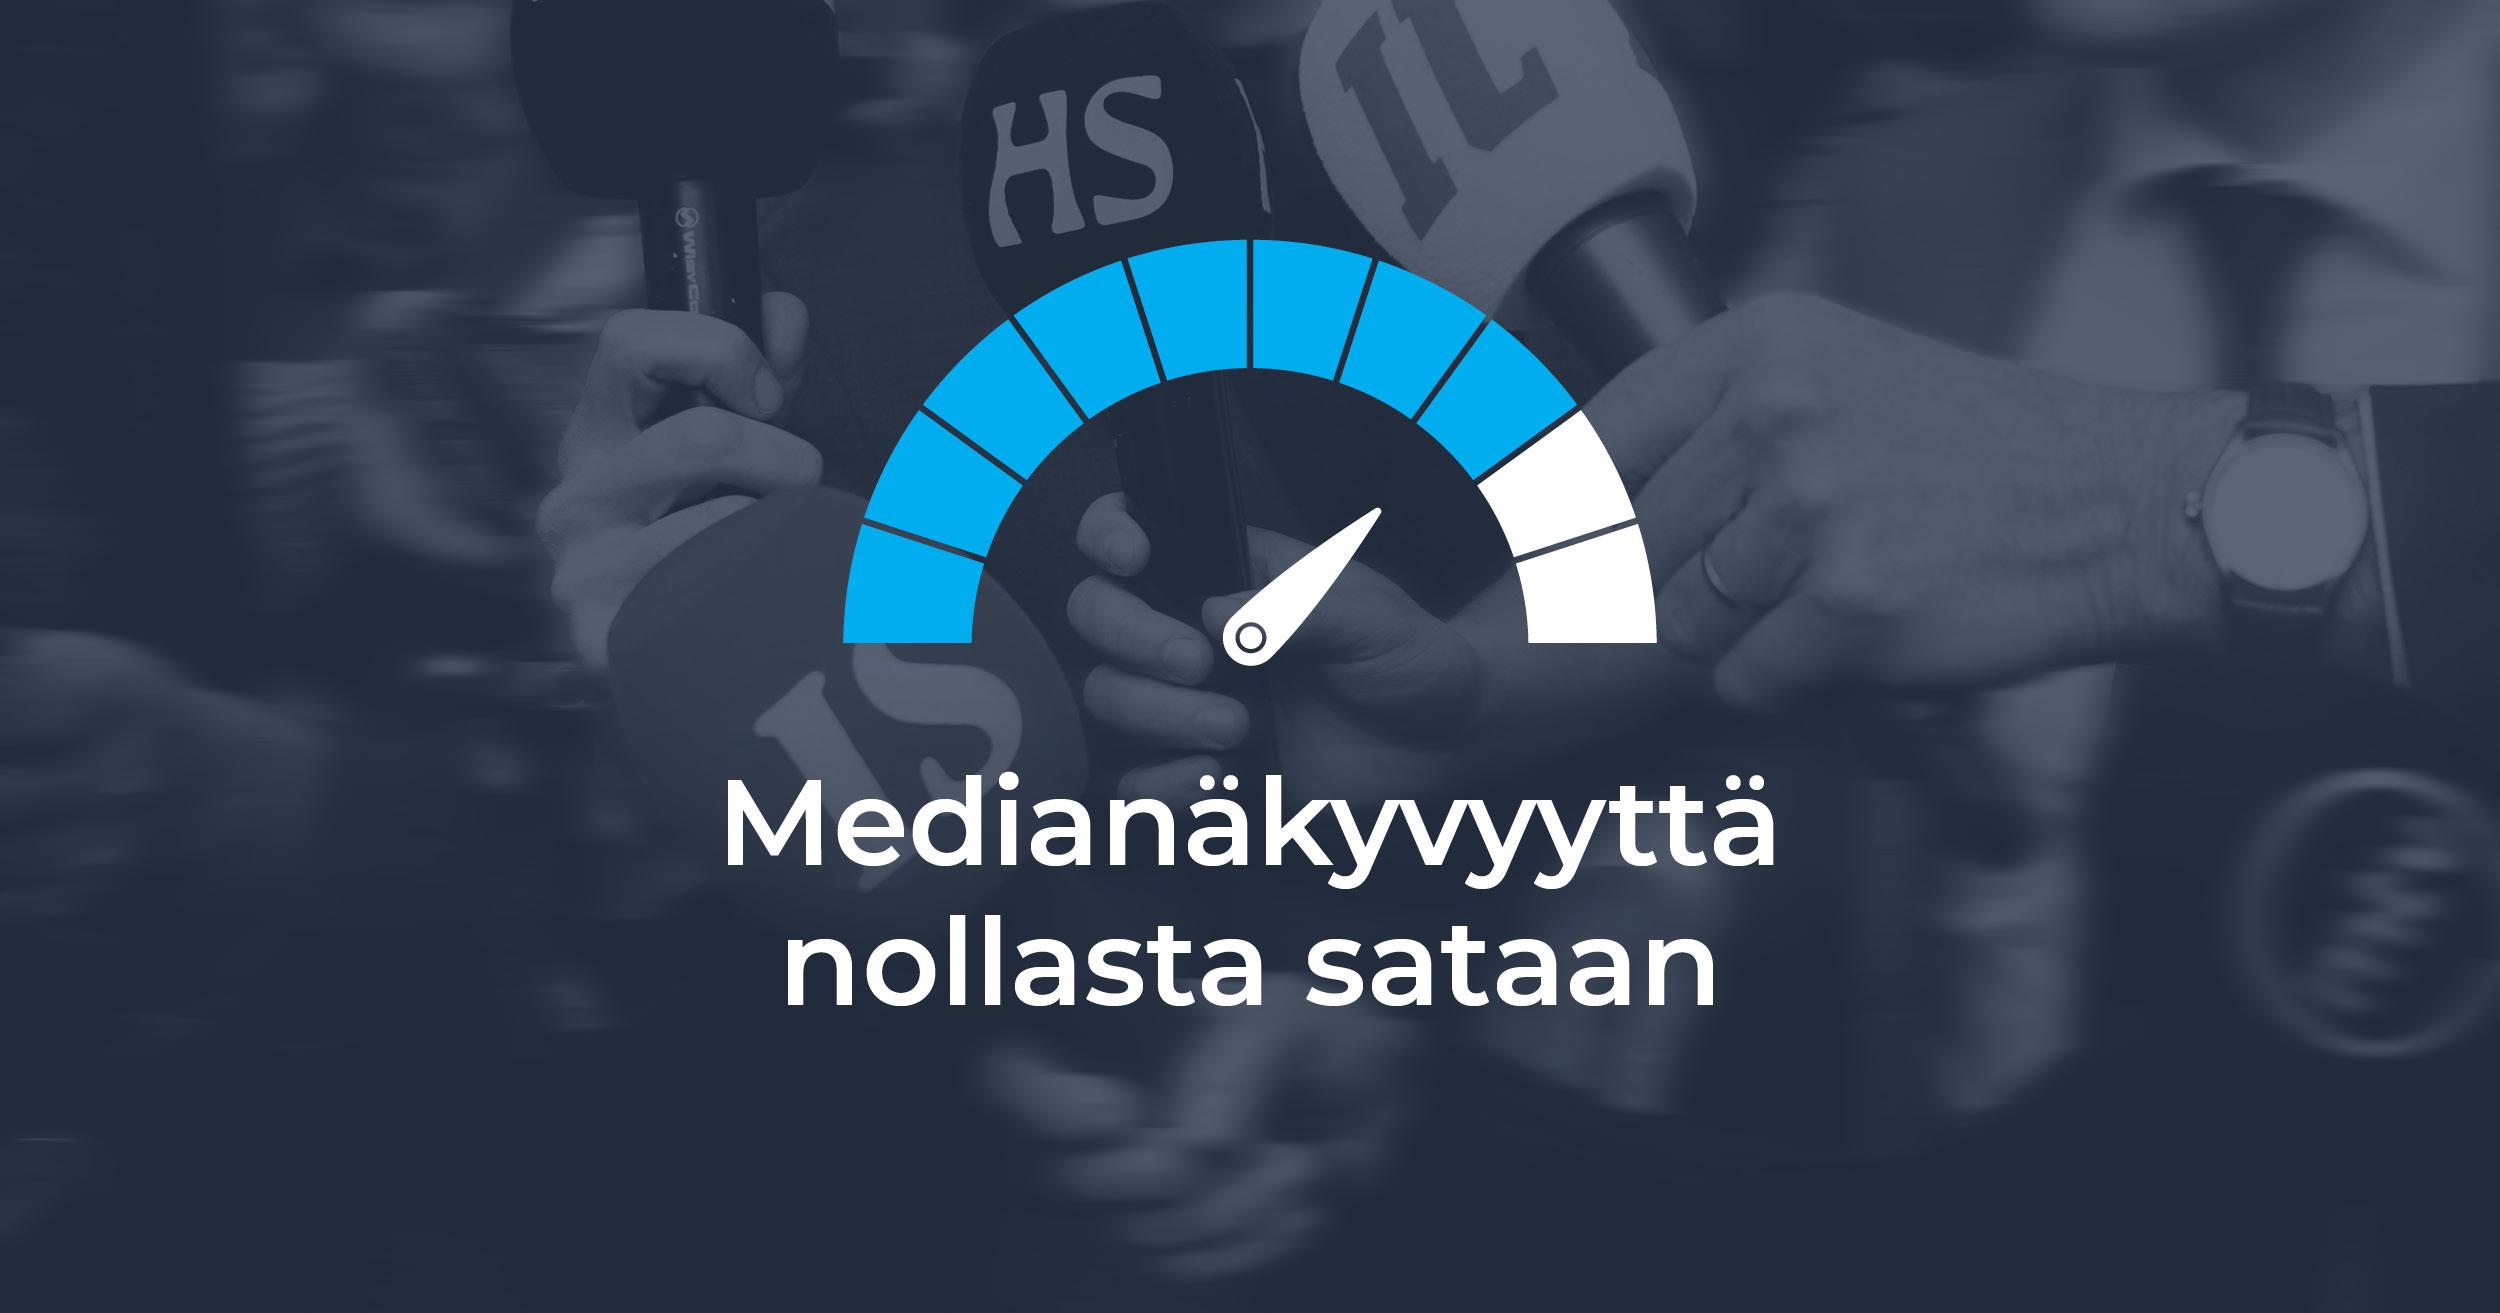 STT-Medianakyvyytta_nollasta_sataan_bannerit_1200x630